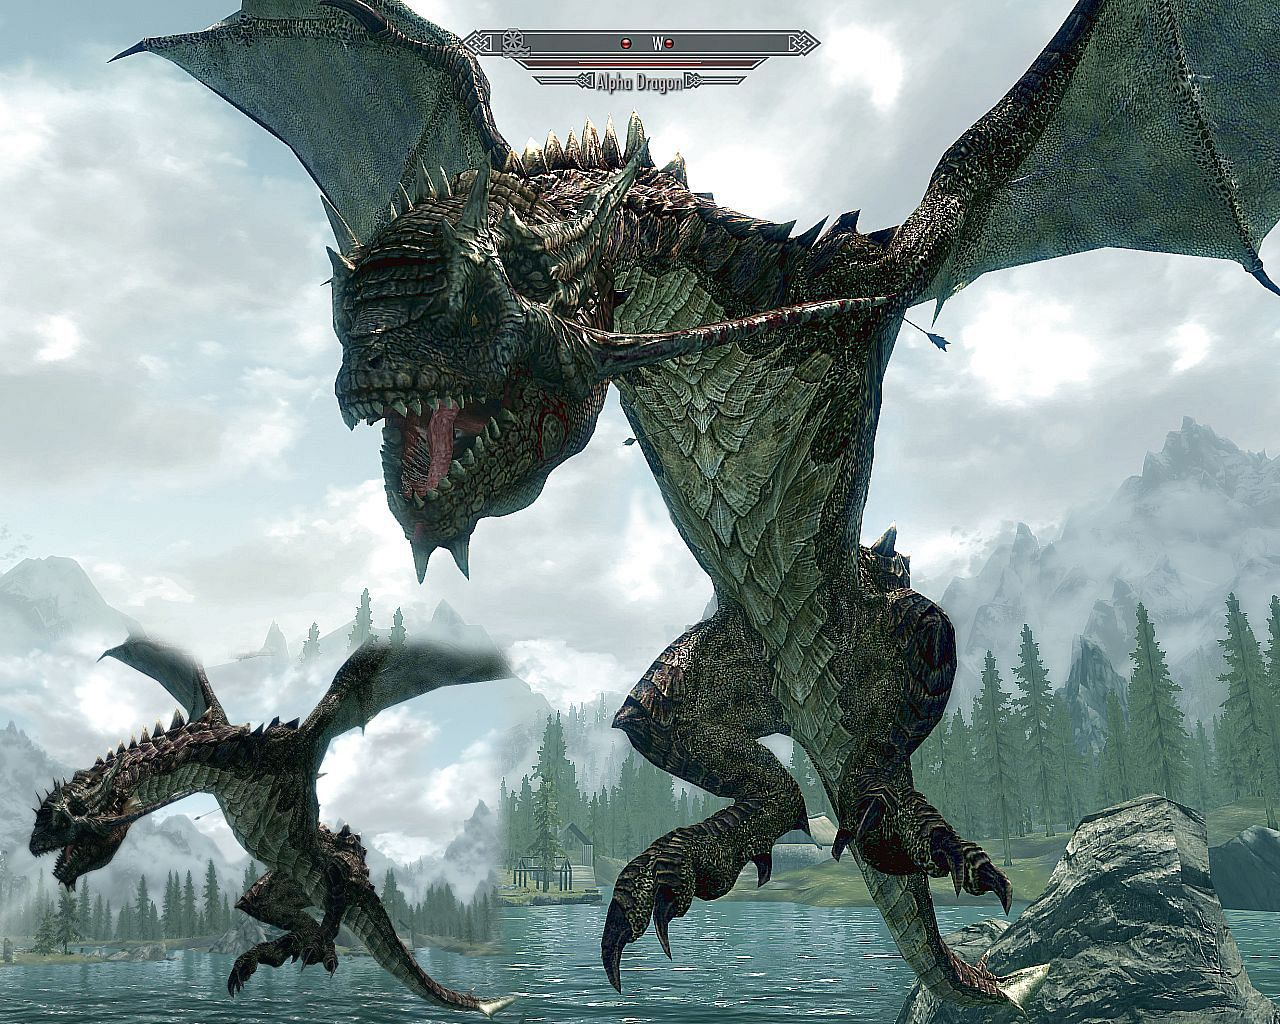 Skyrim Dragon: SkyMoMod V13 For Elder Scrolls V